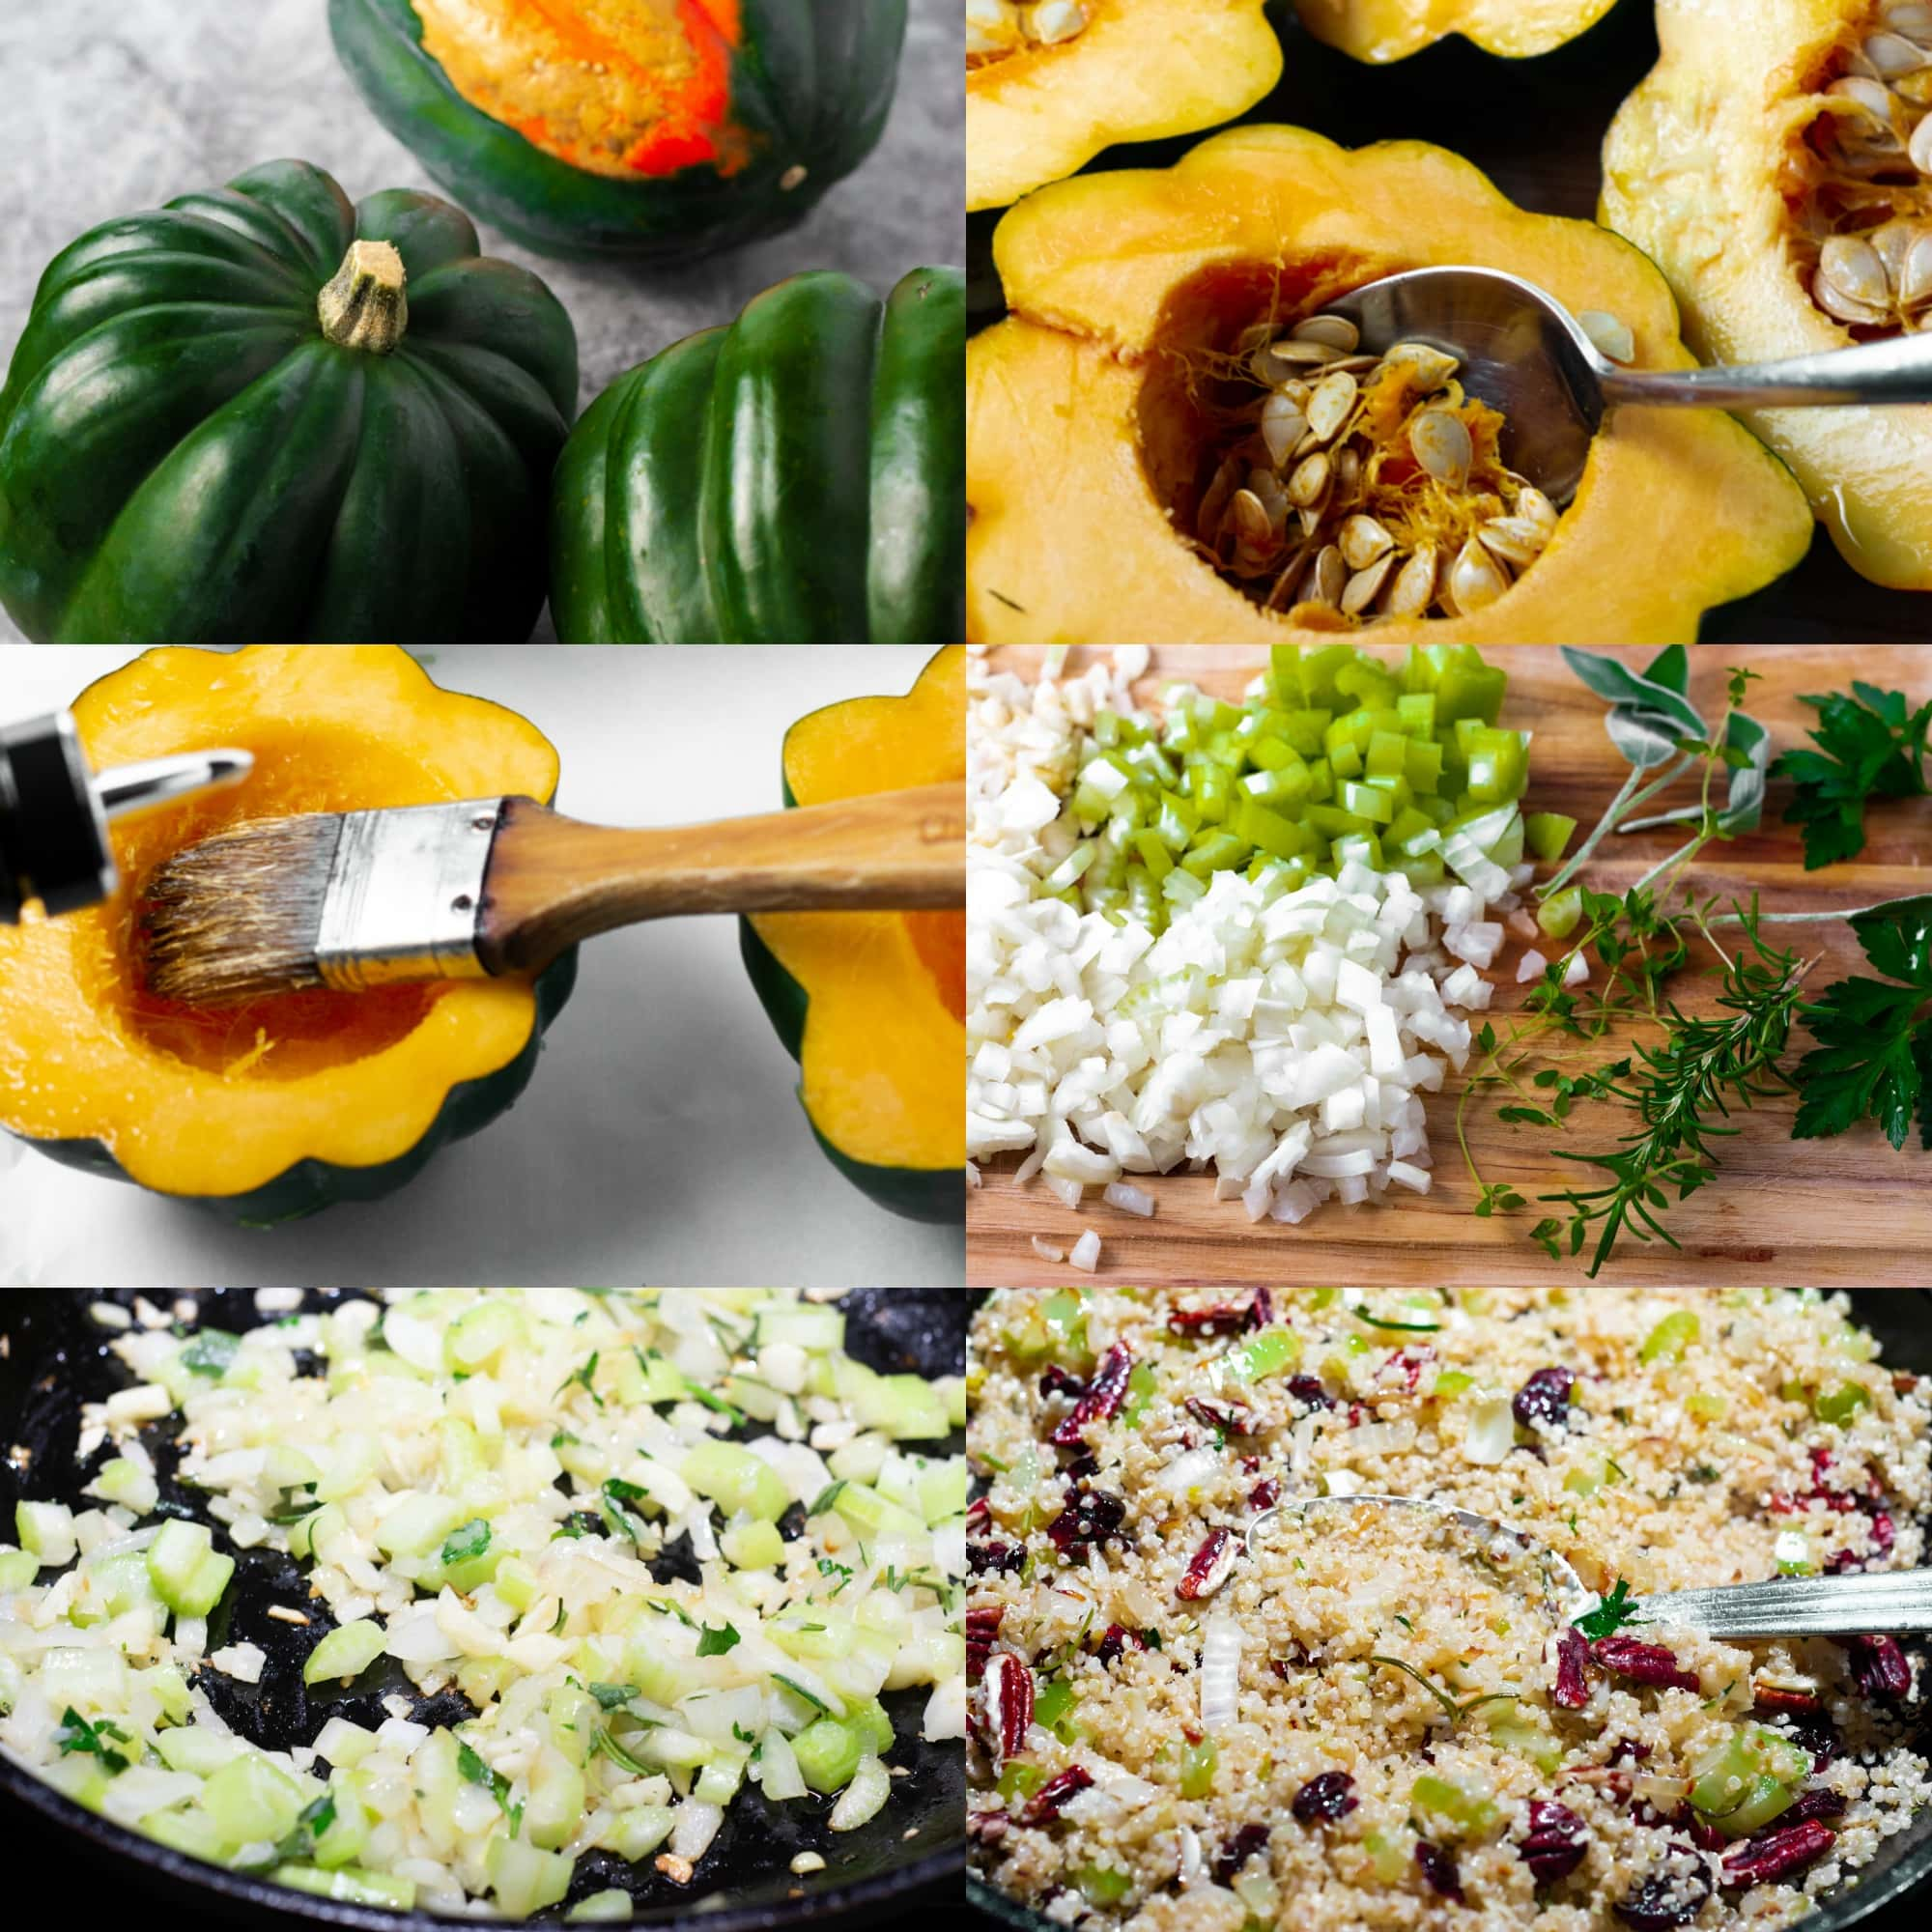 Vegan Baked Acorn Squash process shots